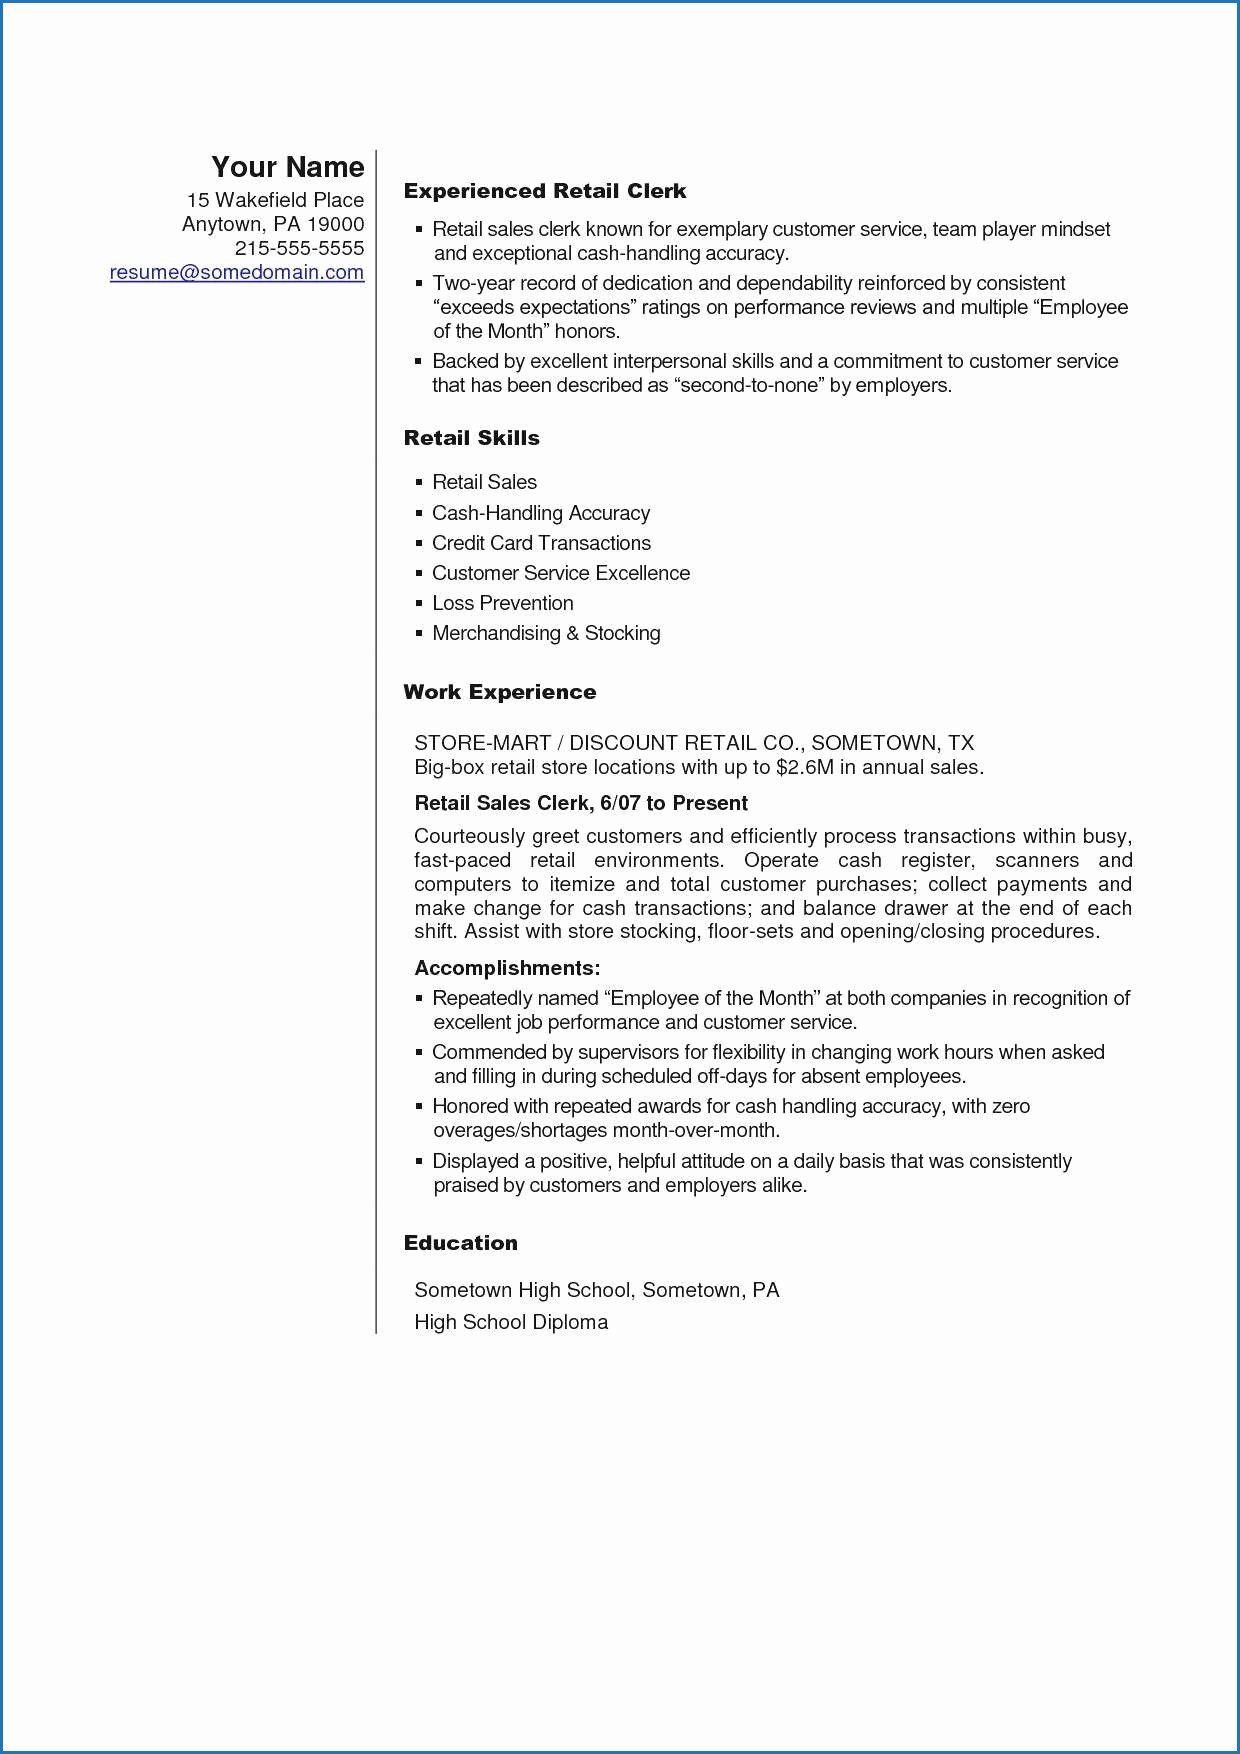 20 Stock Job Description Resume Job description, Resume